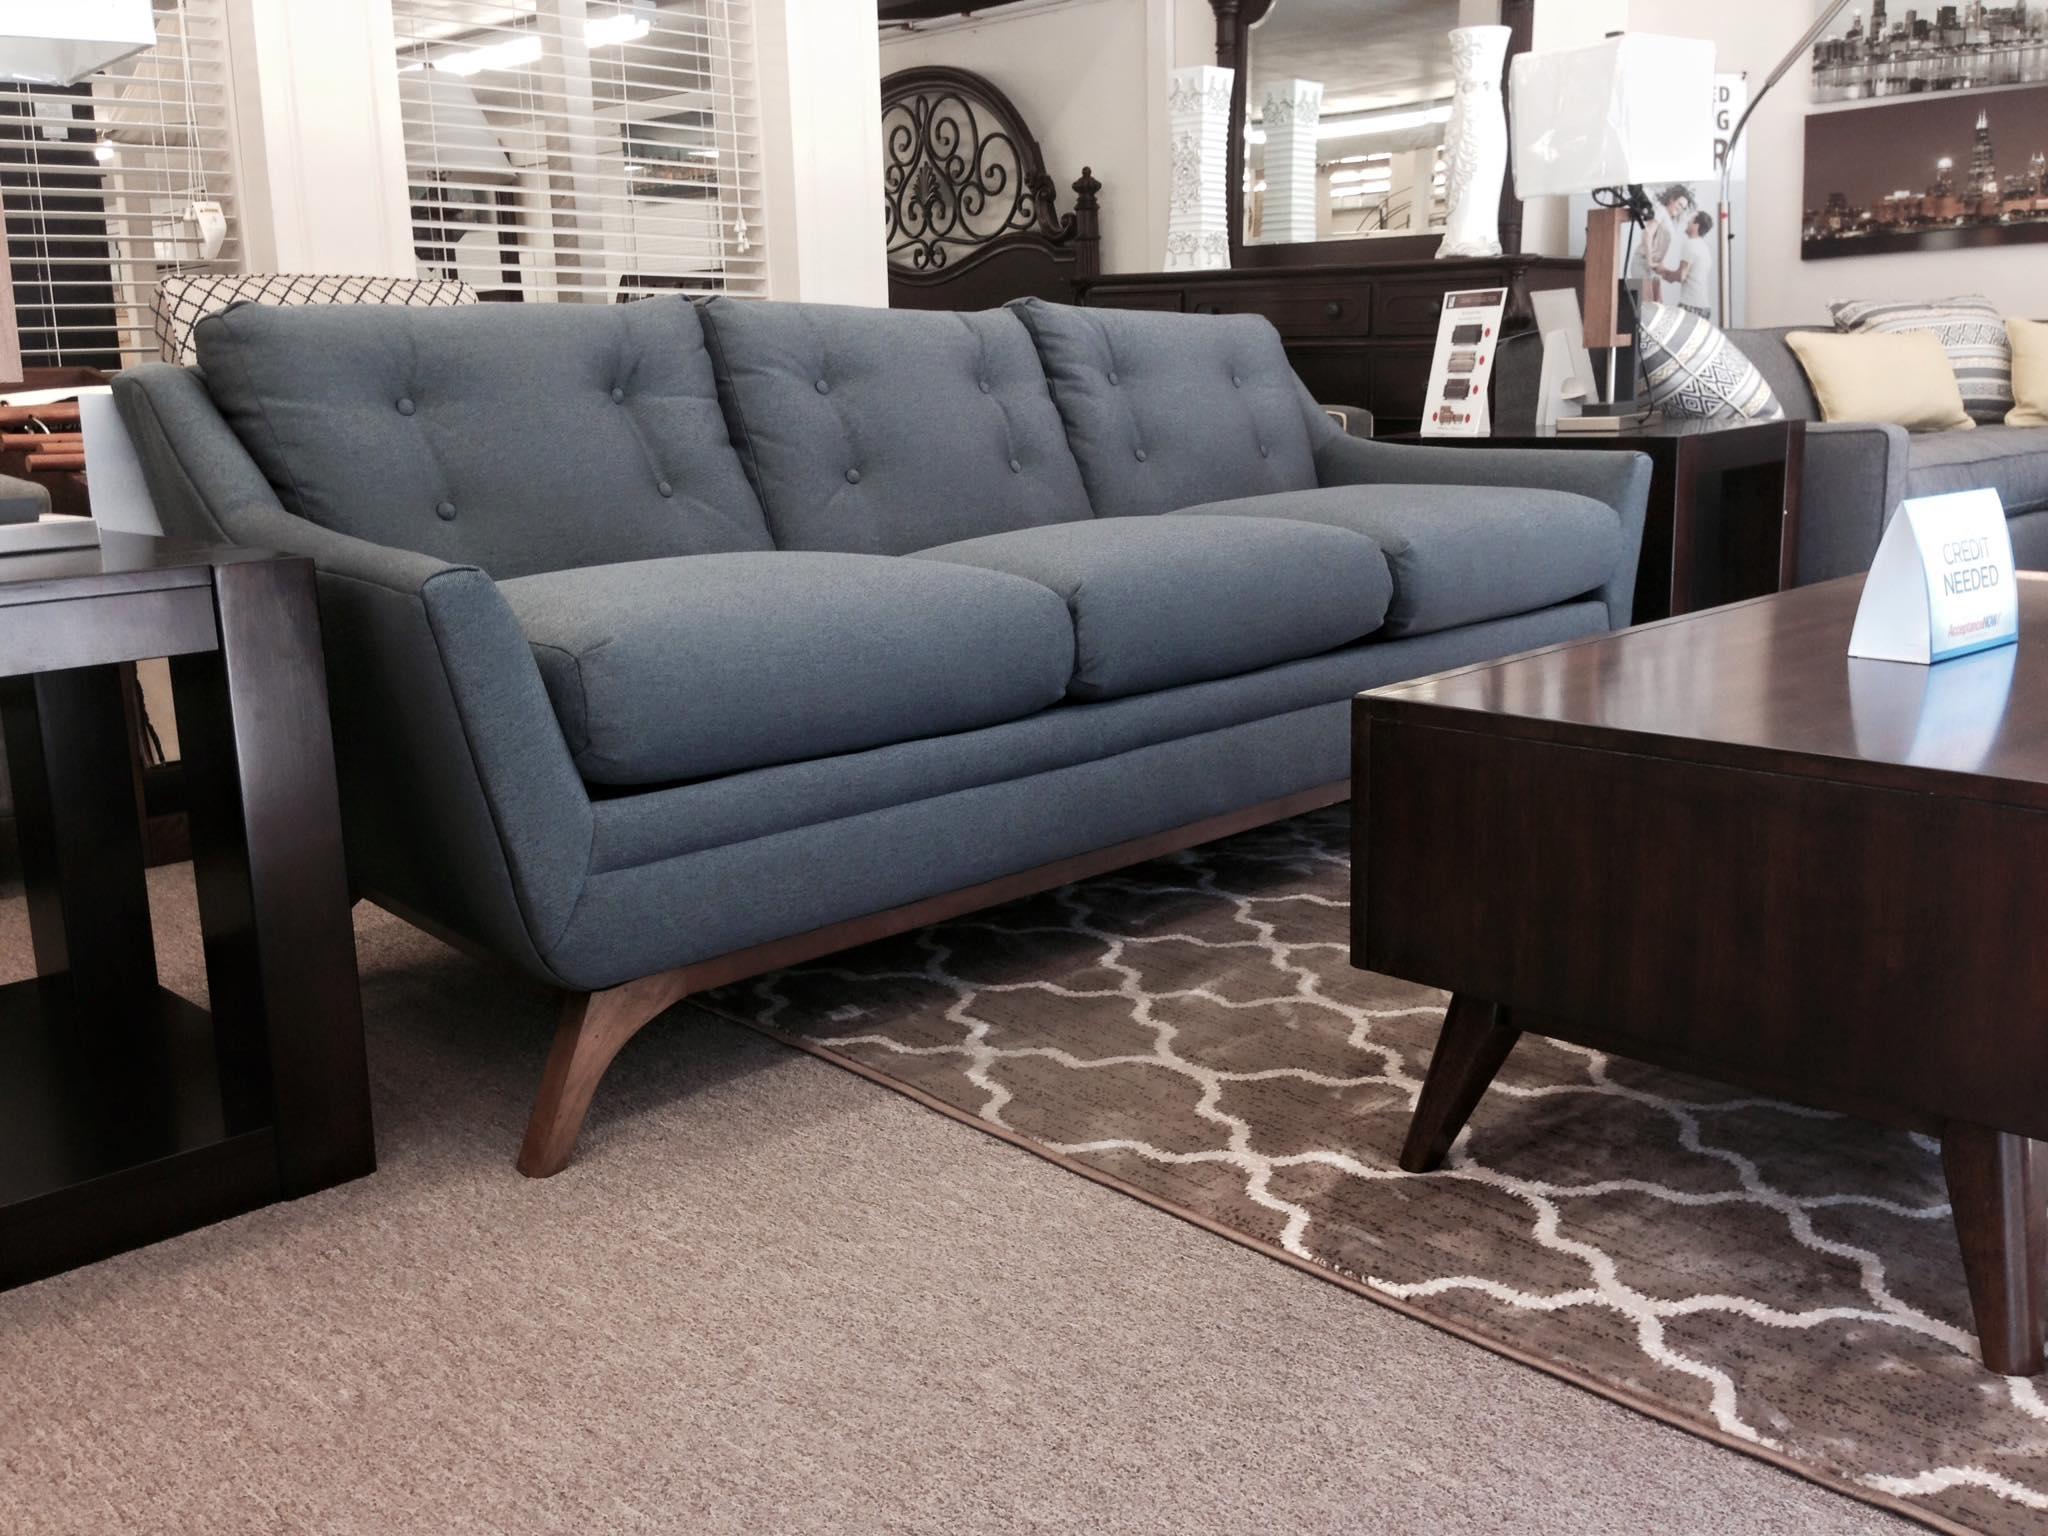 S Used Furniture Chicago Il Craigslist Chicago Il Furniture Green Home Furniture Rental